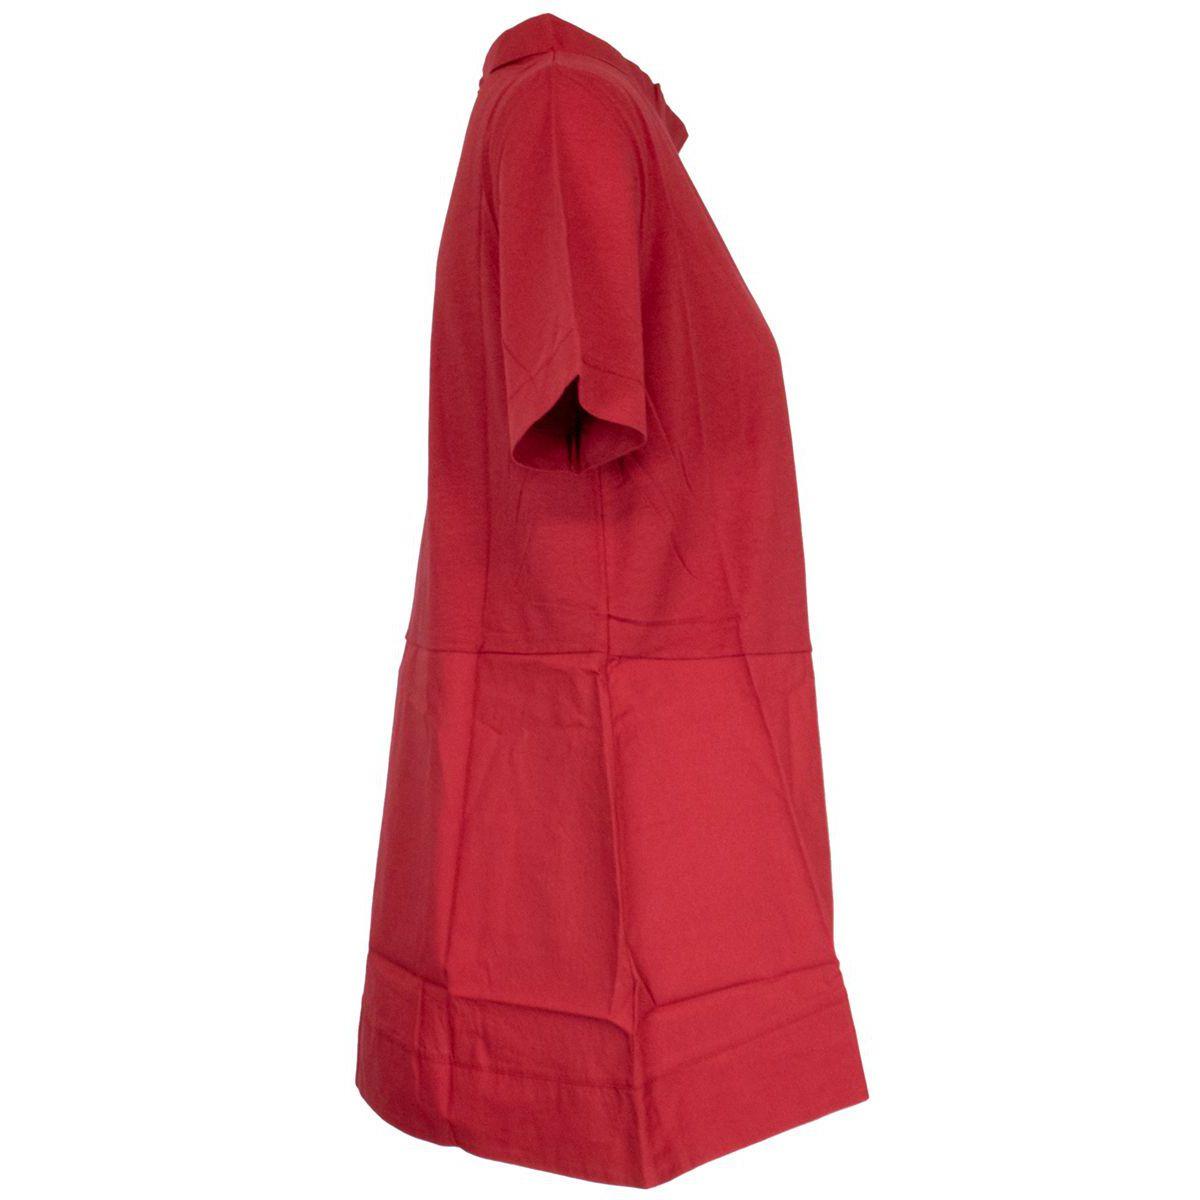 Tiffany cotton sweater India red Alpha Studio